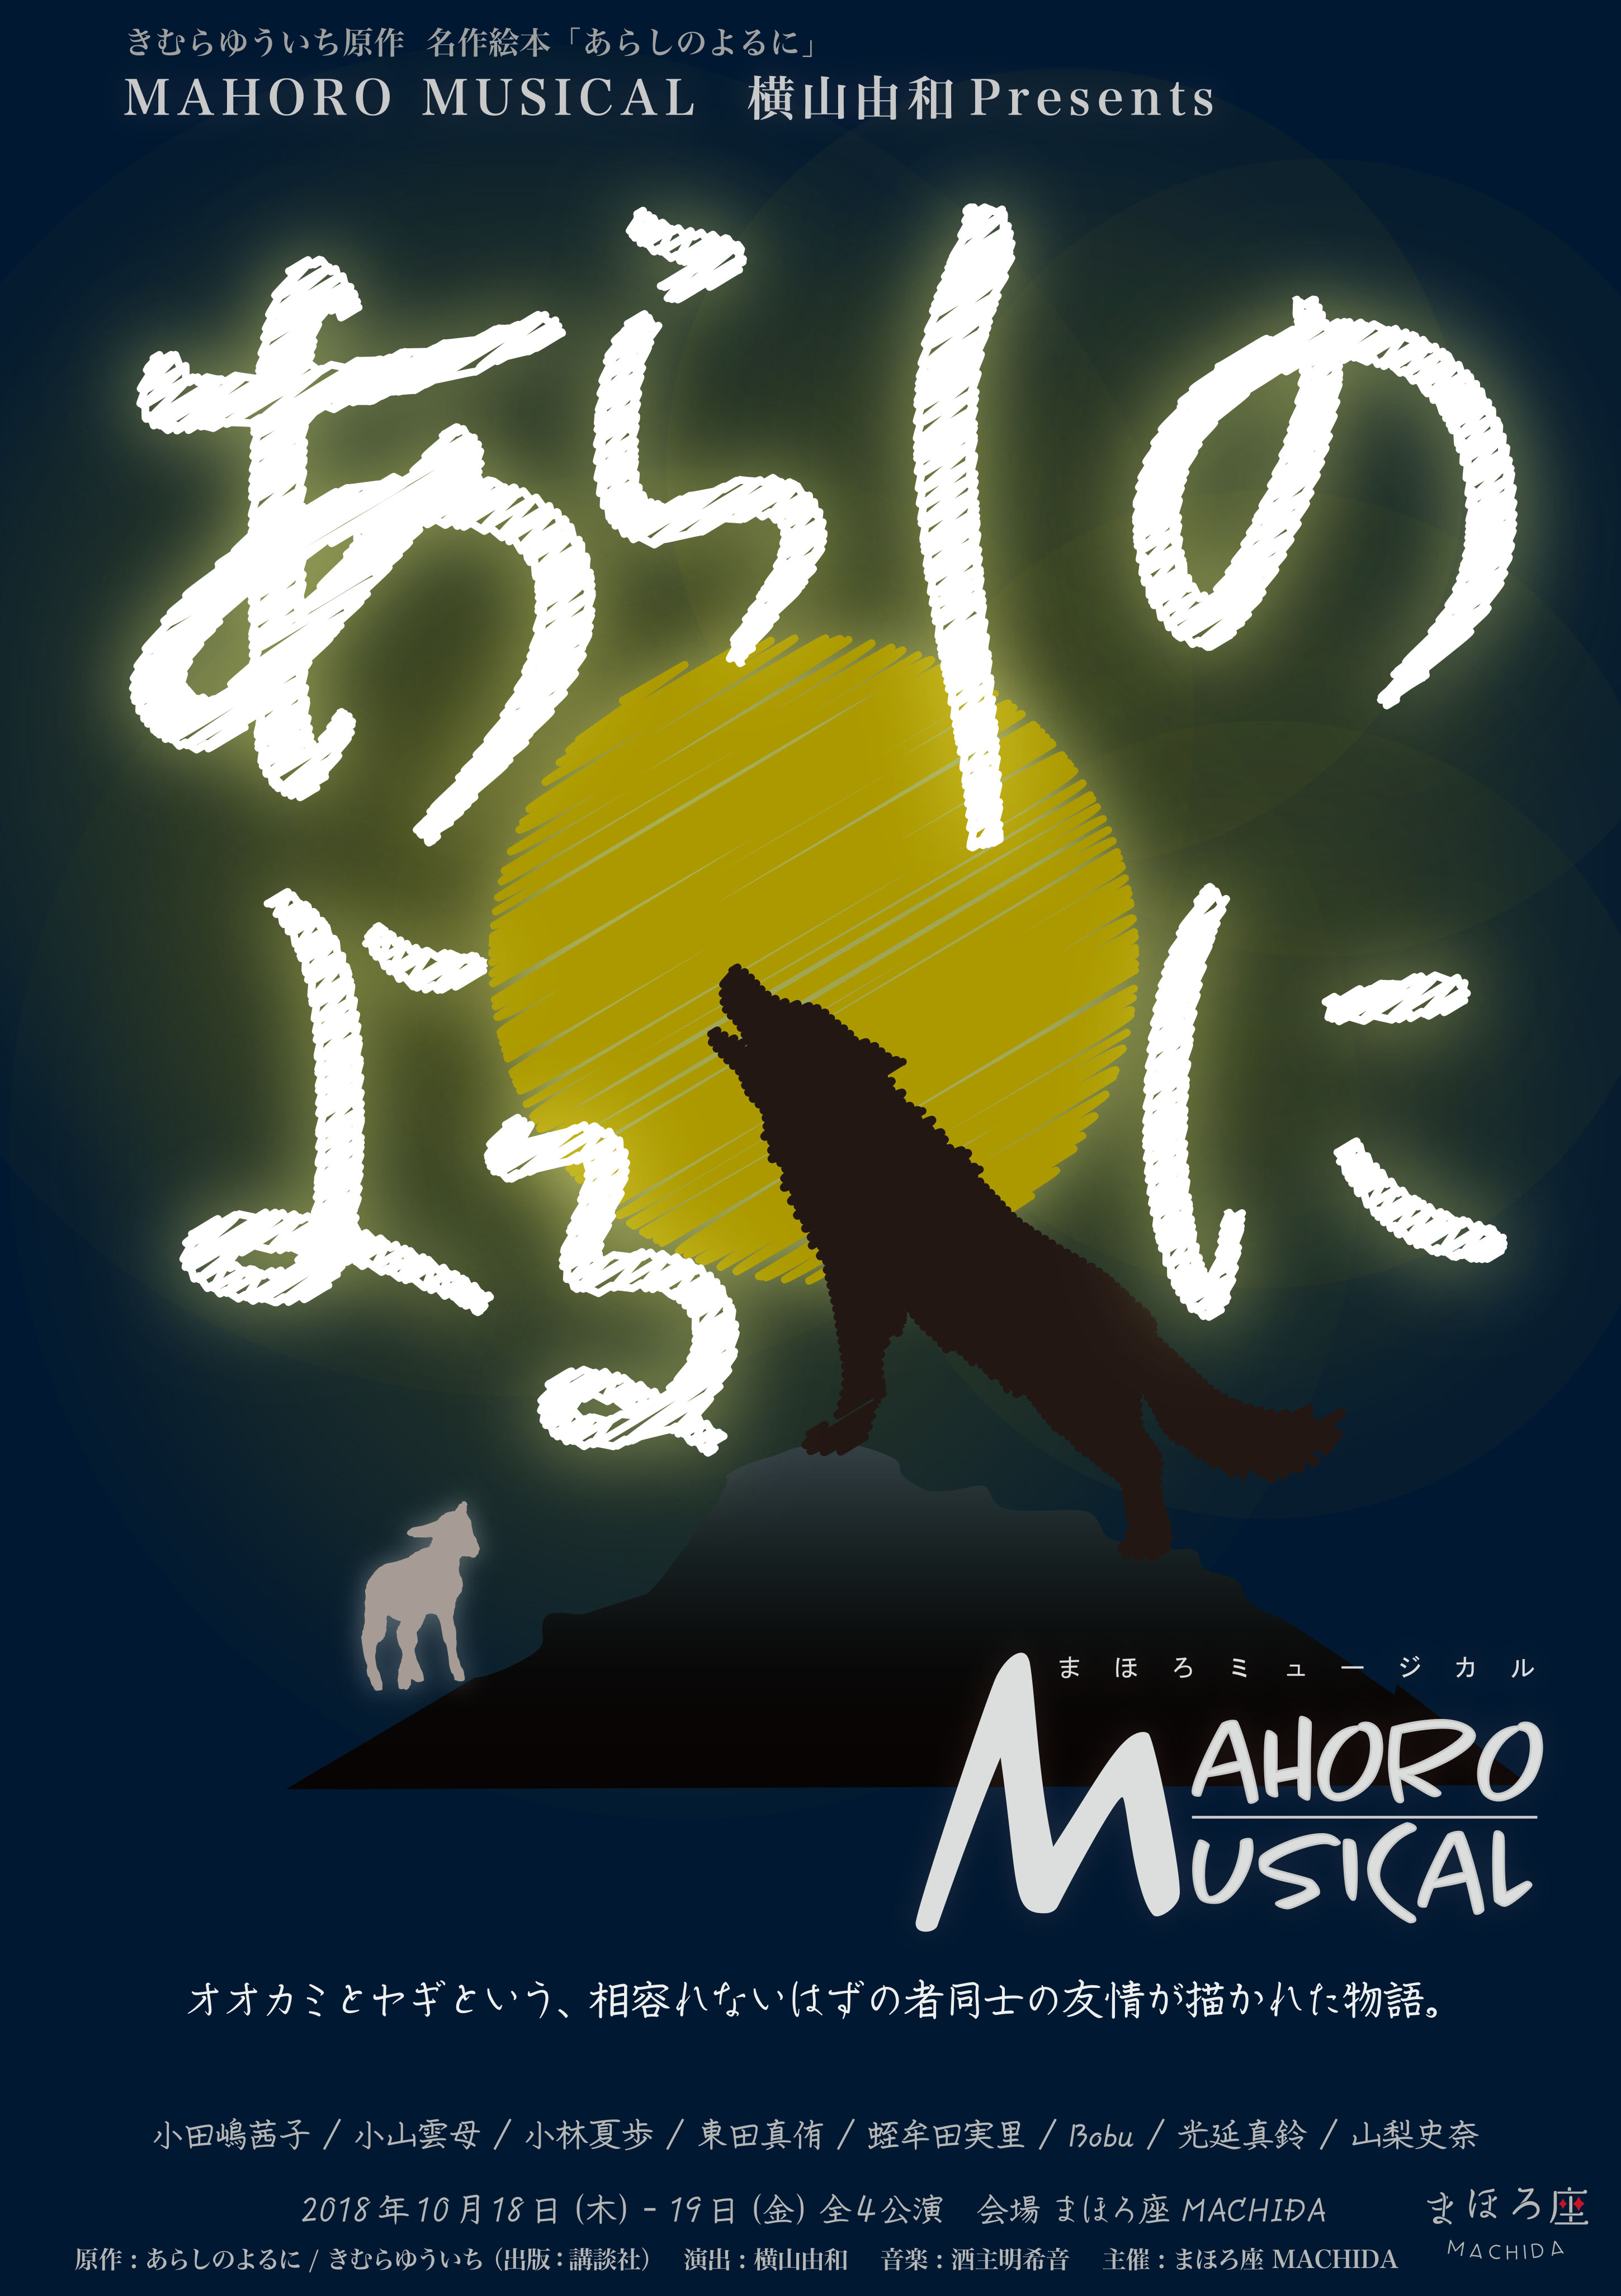 MAHORO MUSICAL 横山由和Presents 「あらしのよるに」